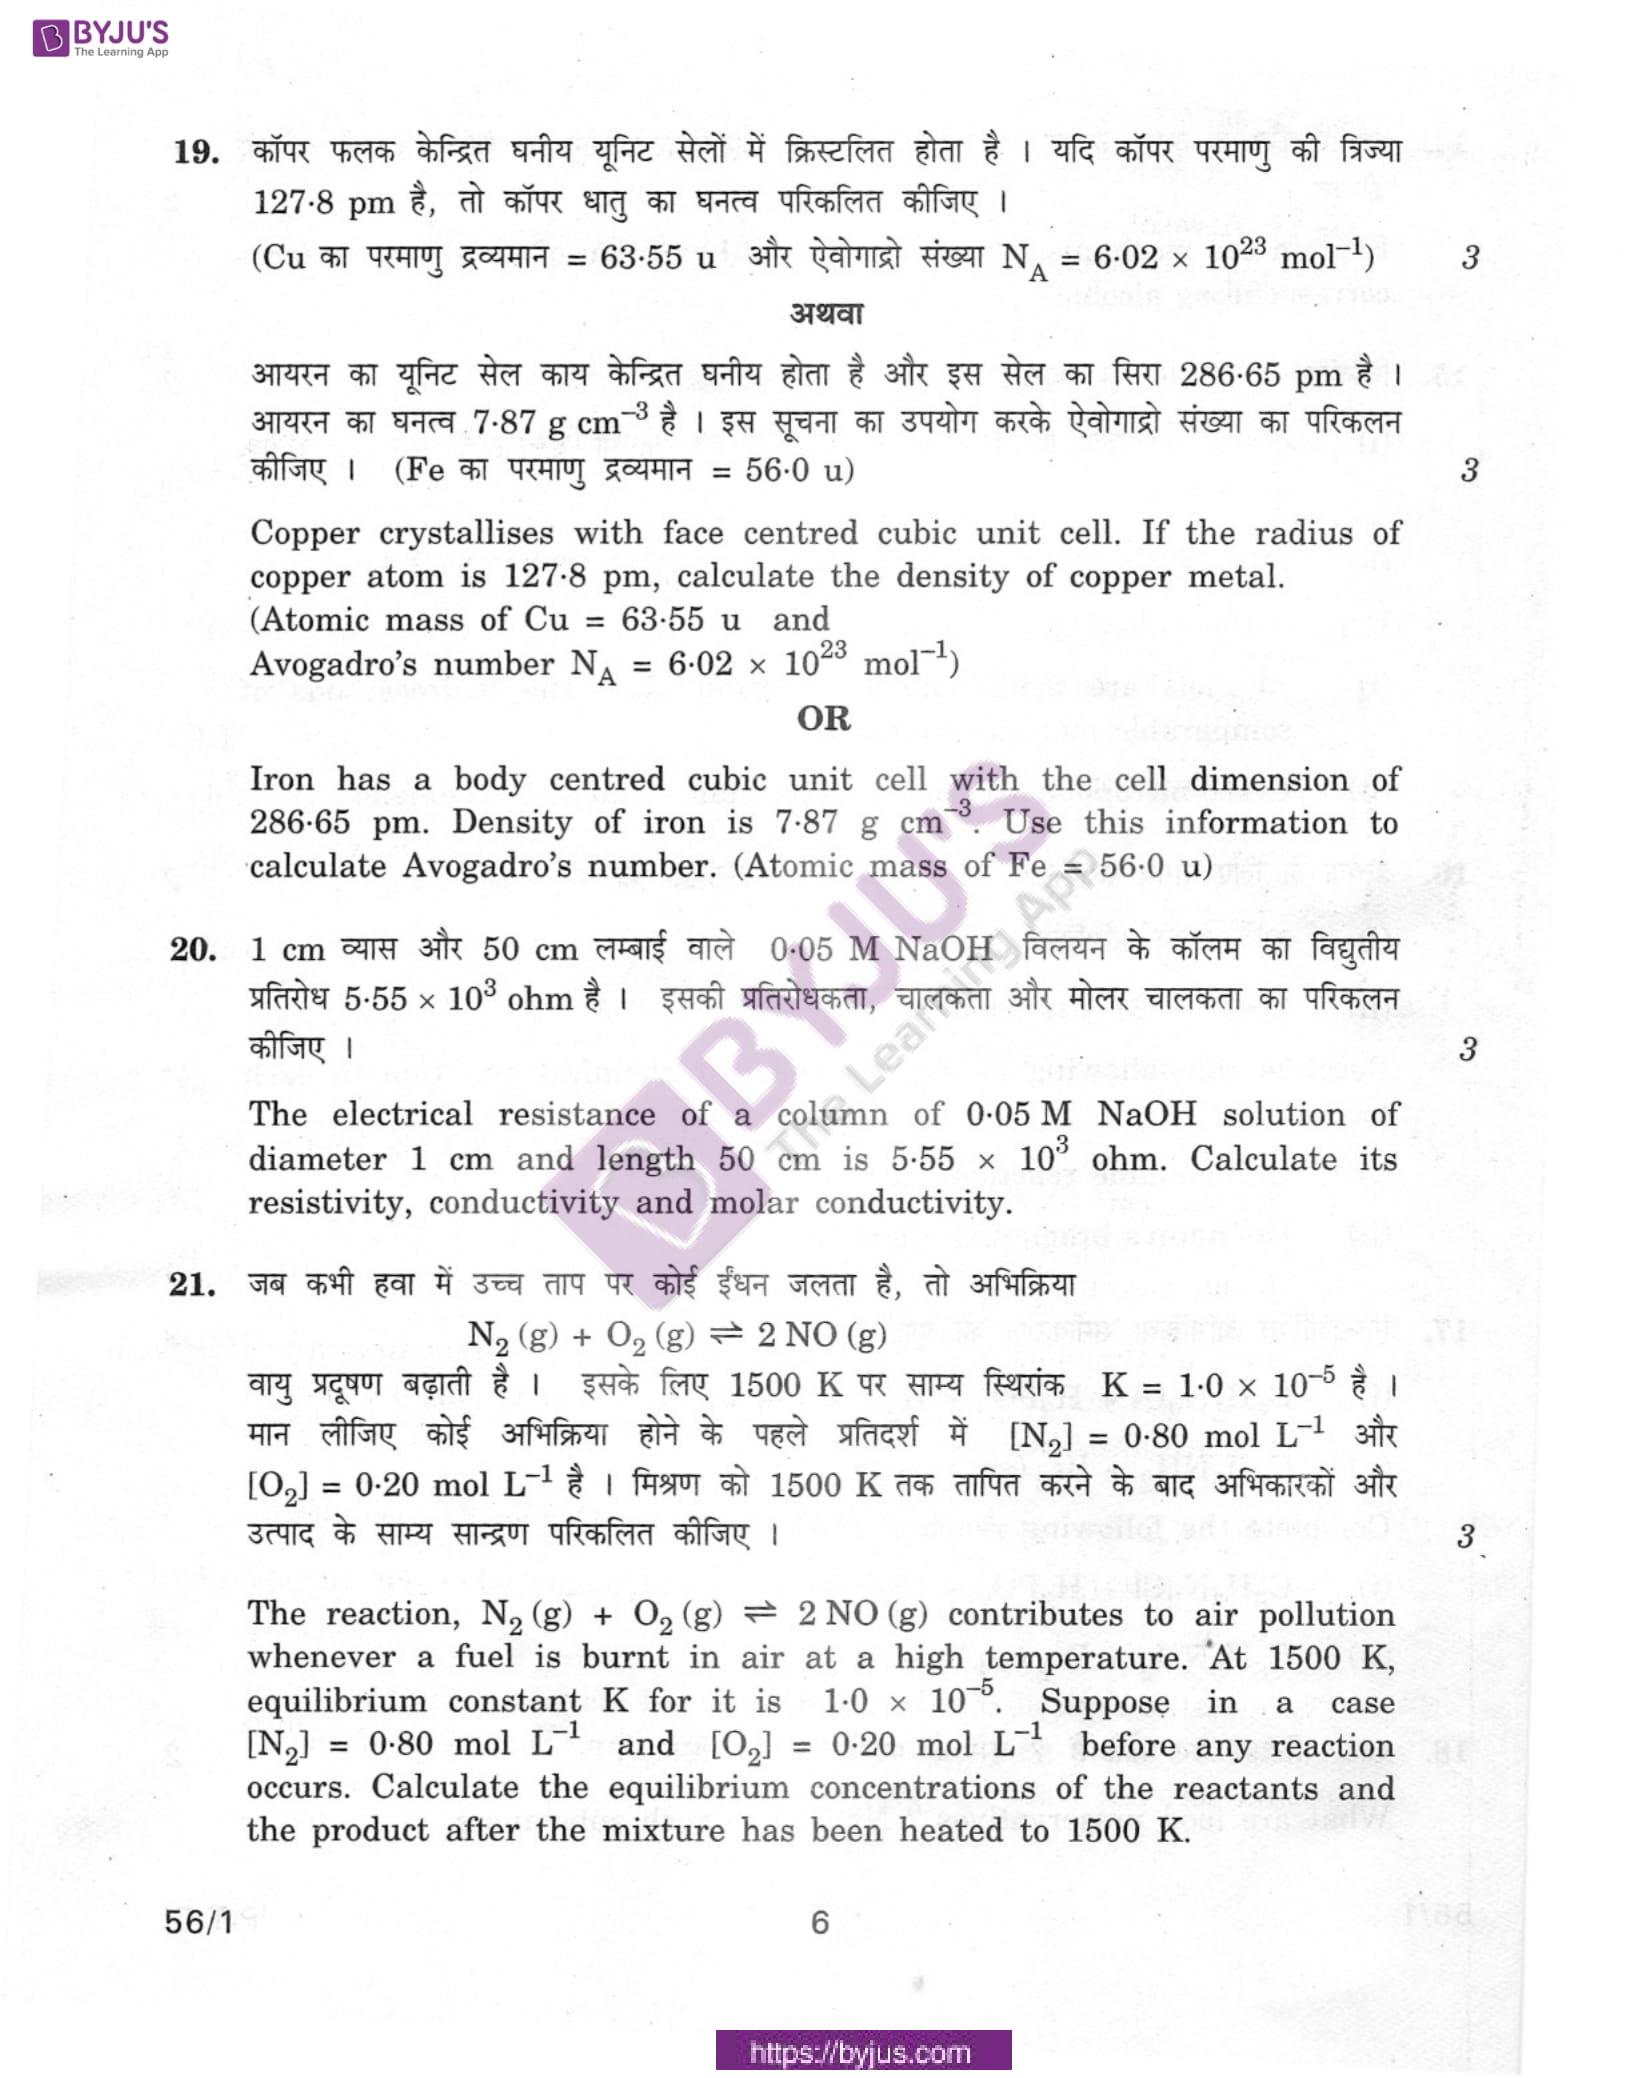 cbse class 10 chemistry question paper 2010 set 1